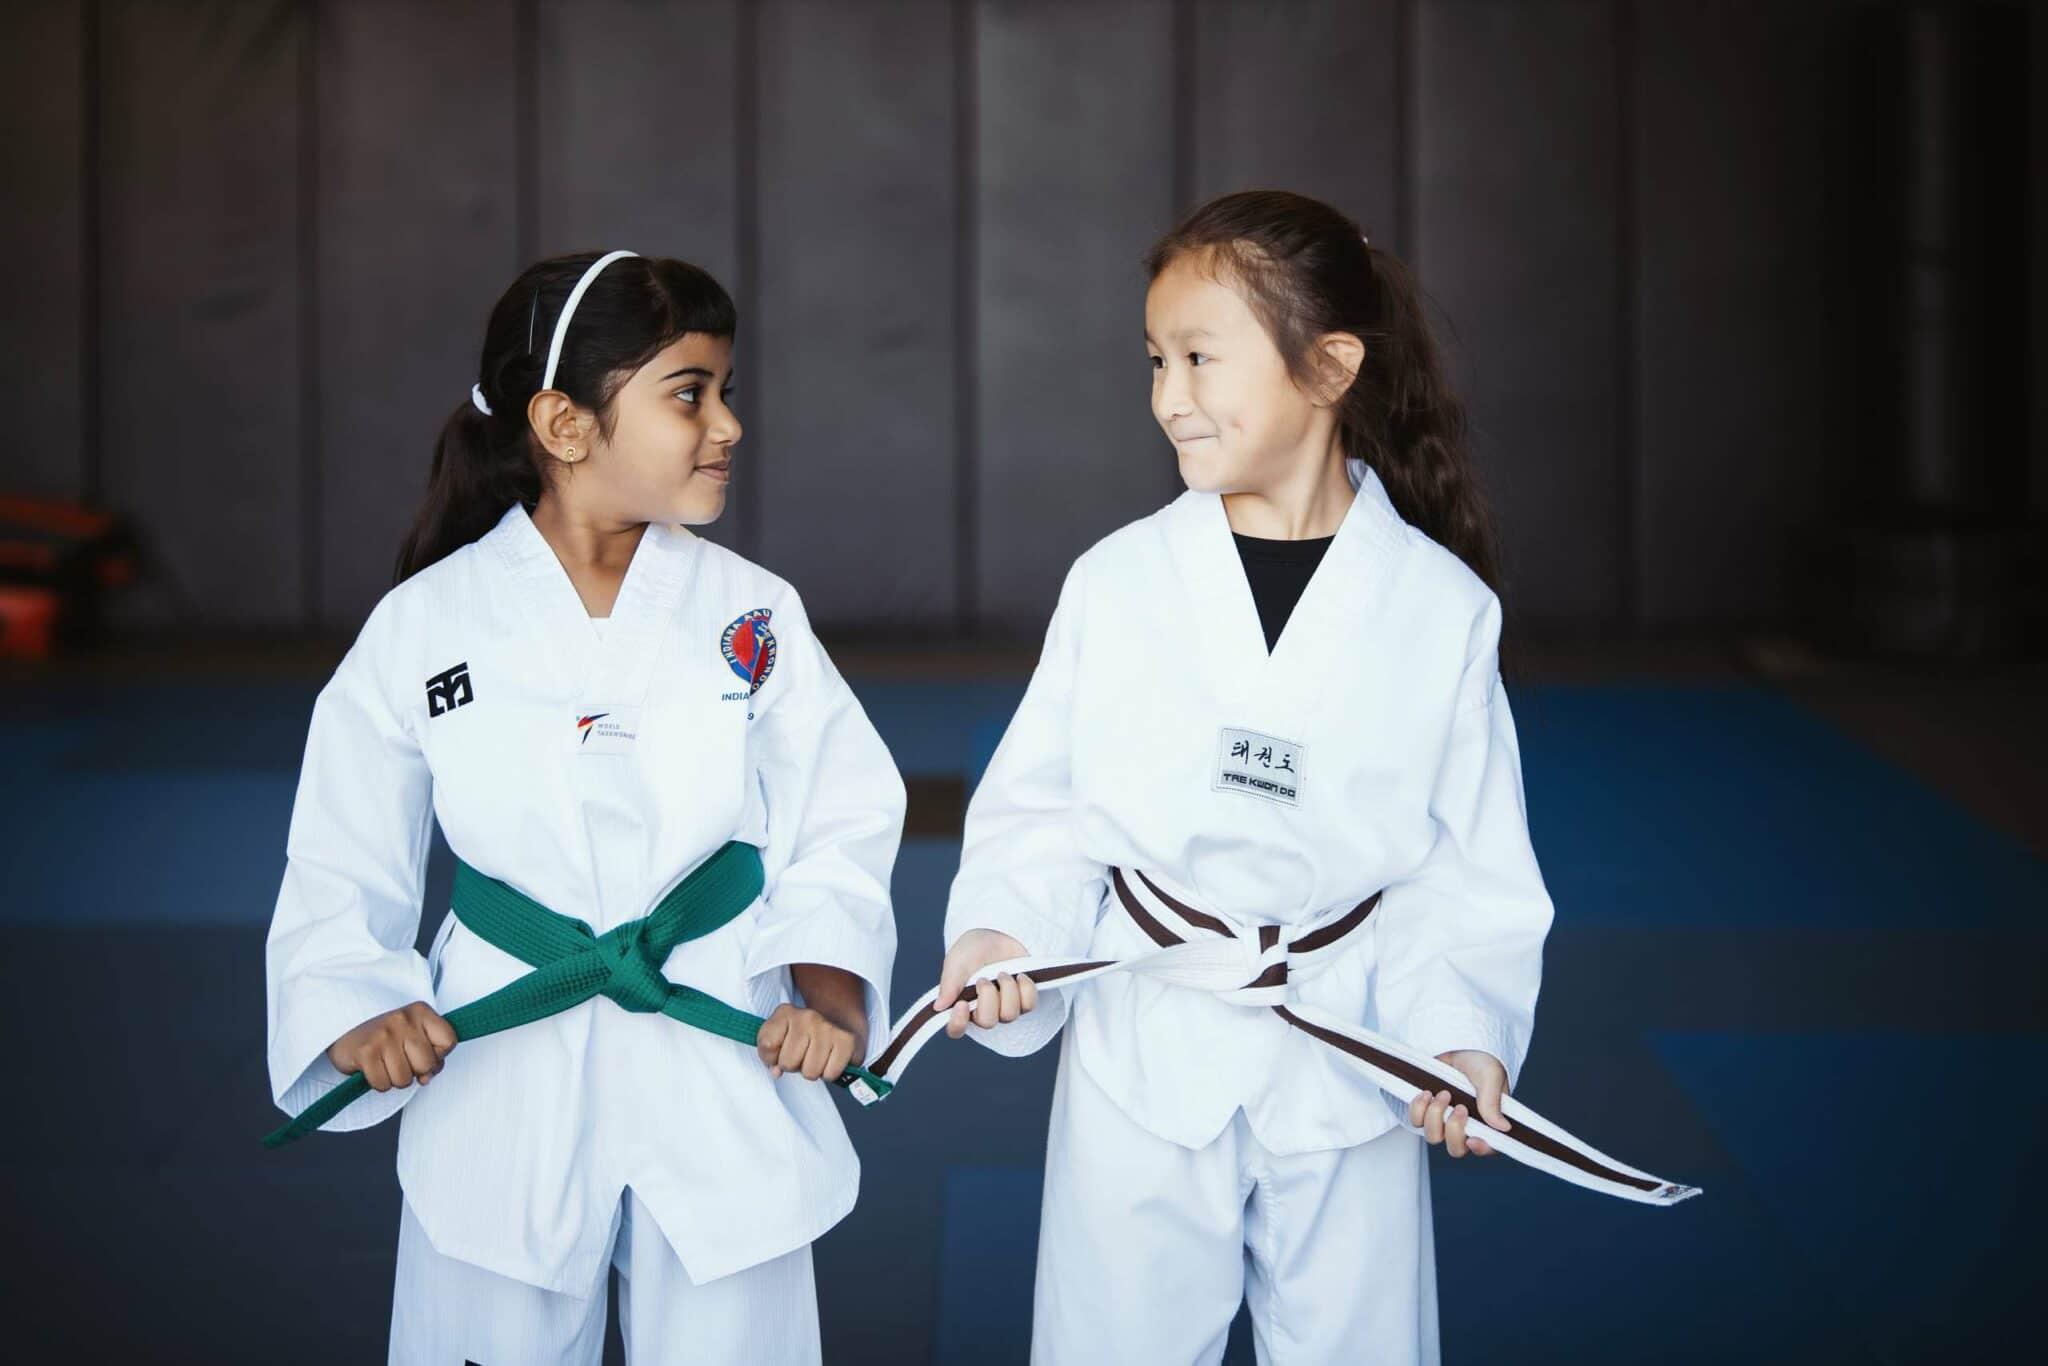 Total Taekwondo Our Kids' Class